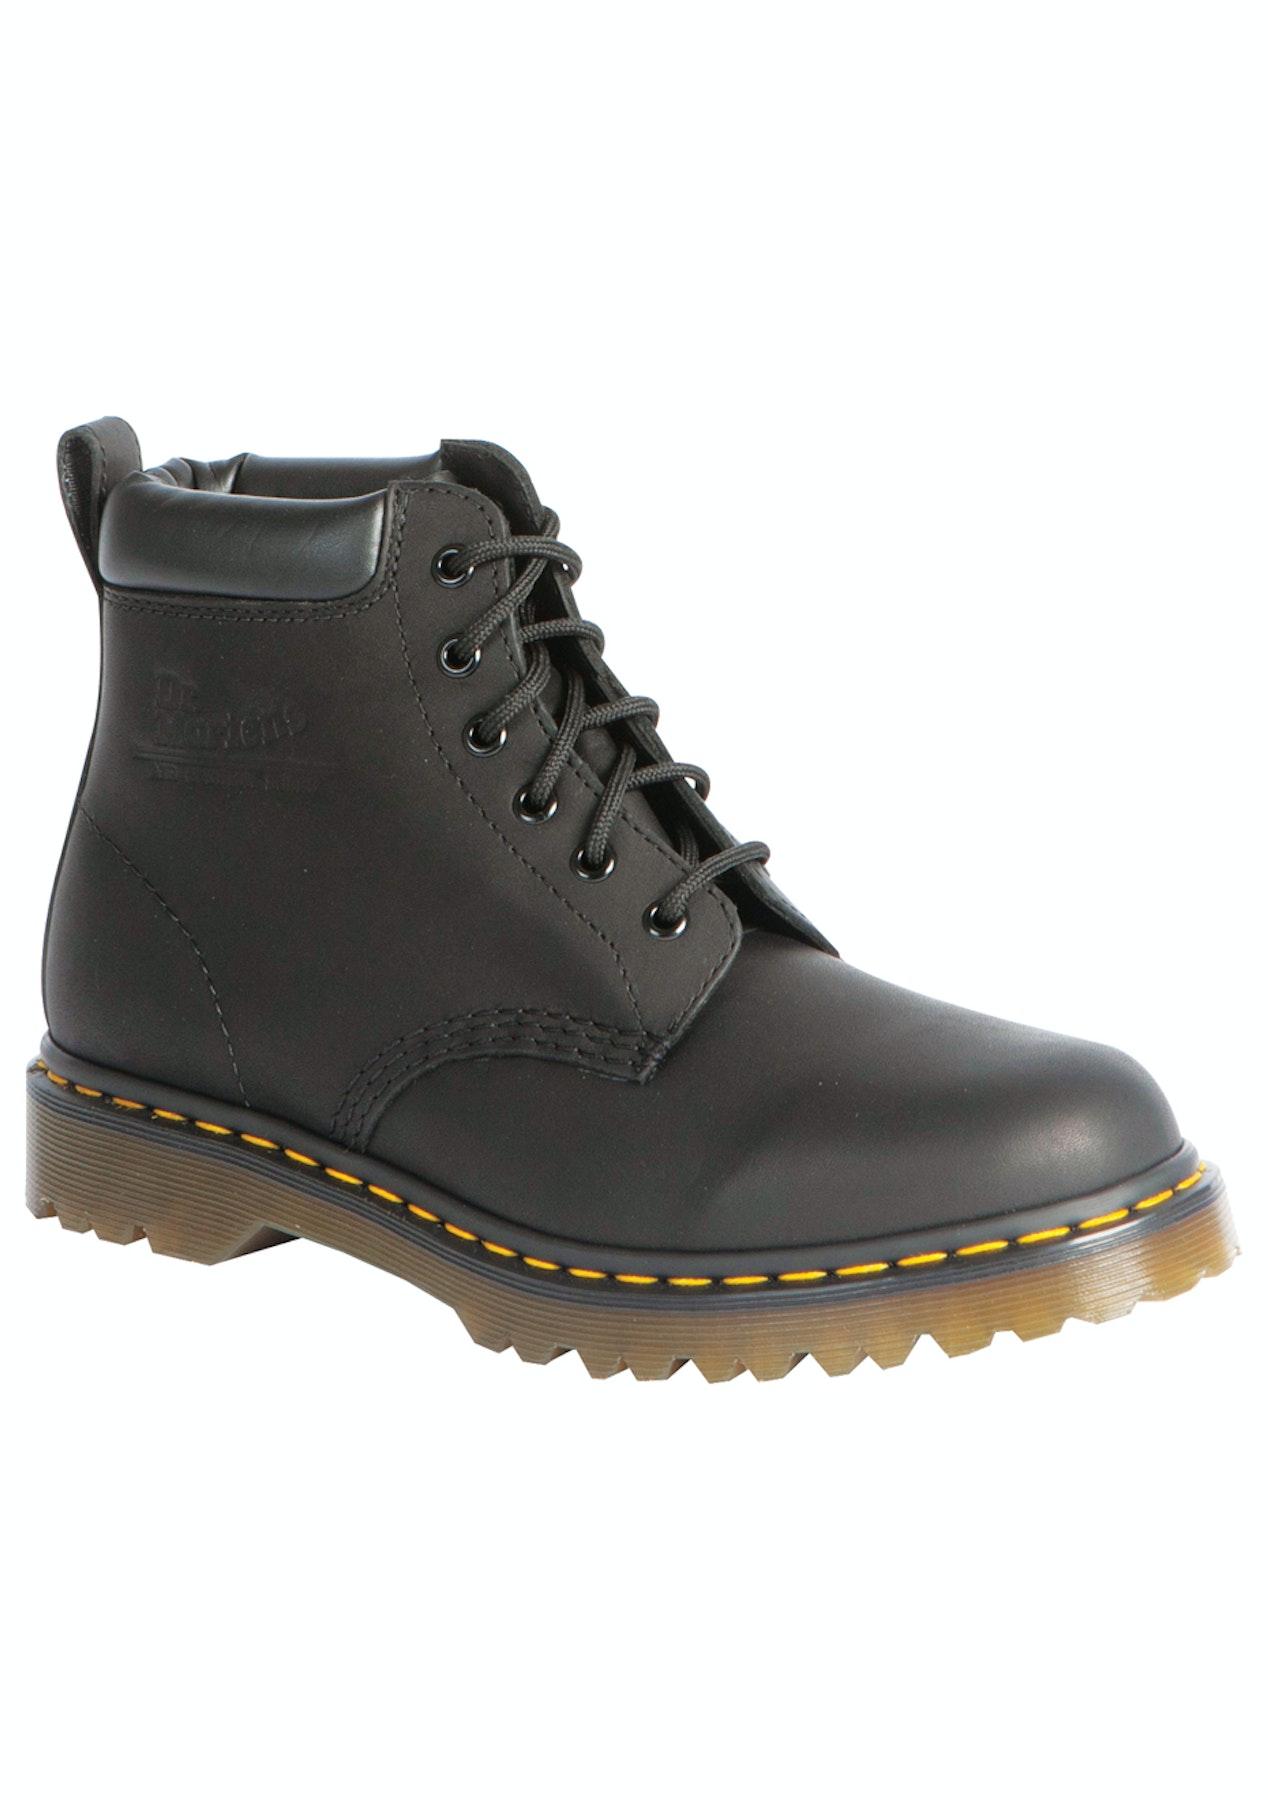 62a4fdbf9c Dr Martens - 939 Ben 6 Eye Boot - Black Greasy